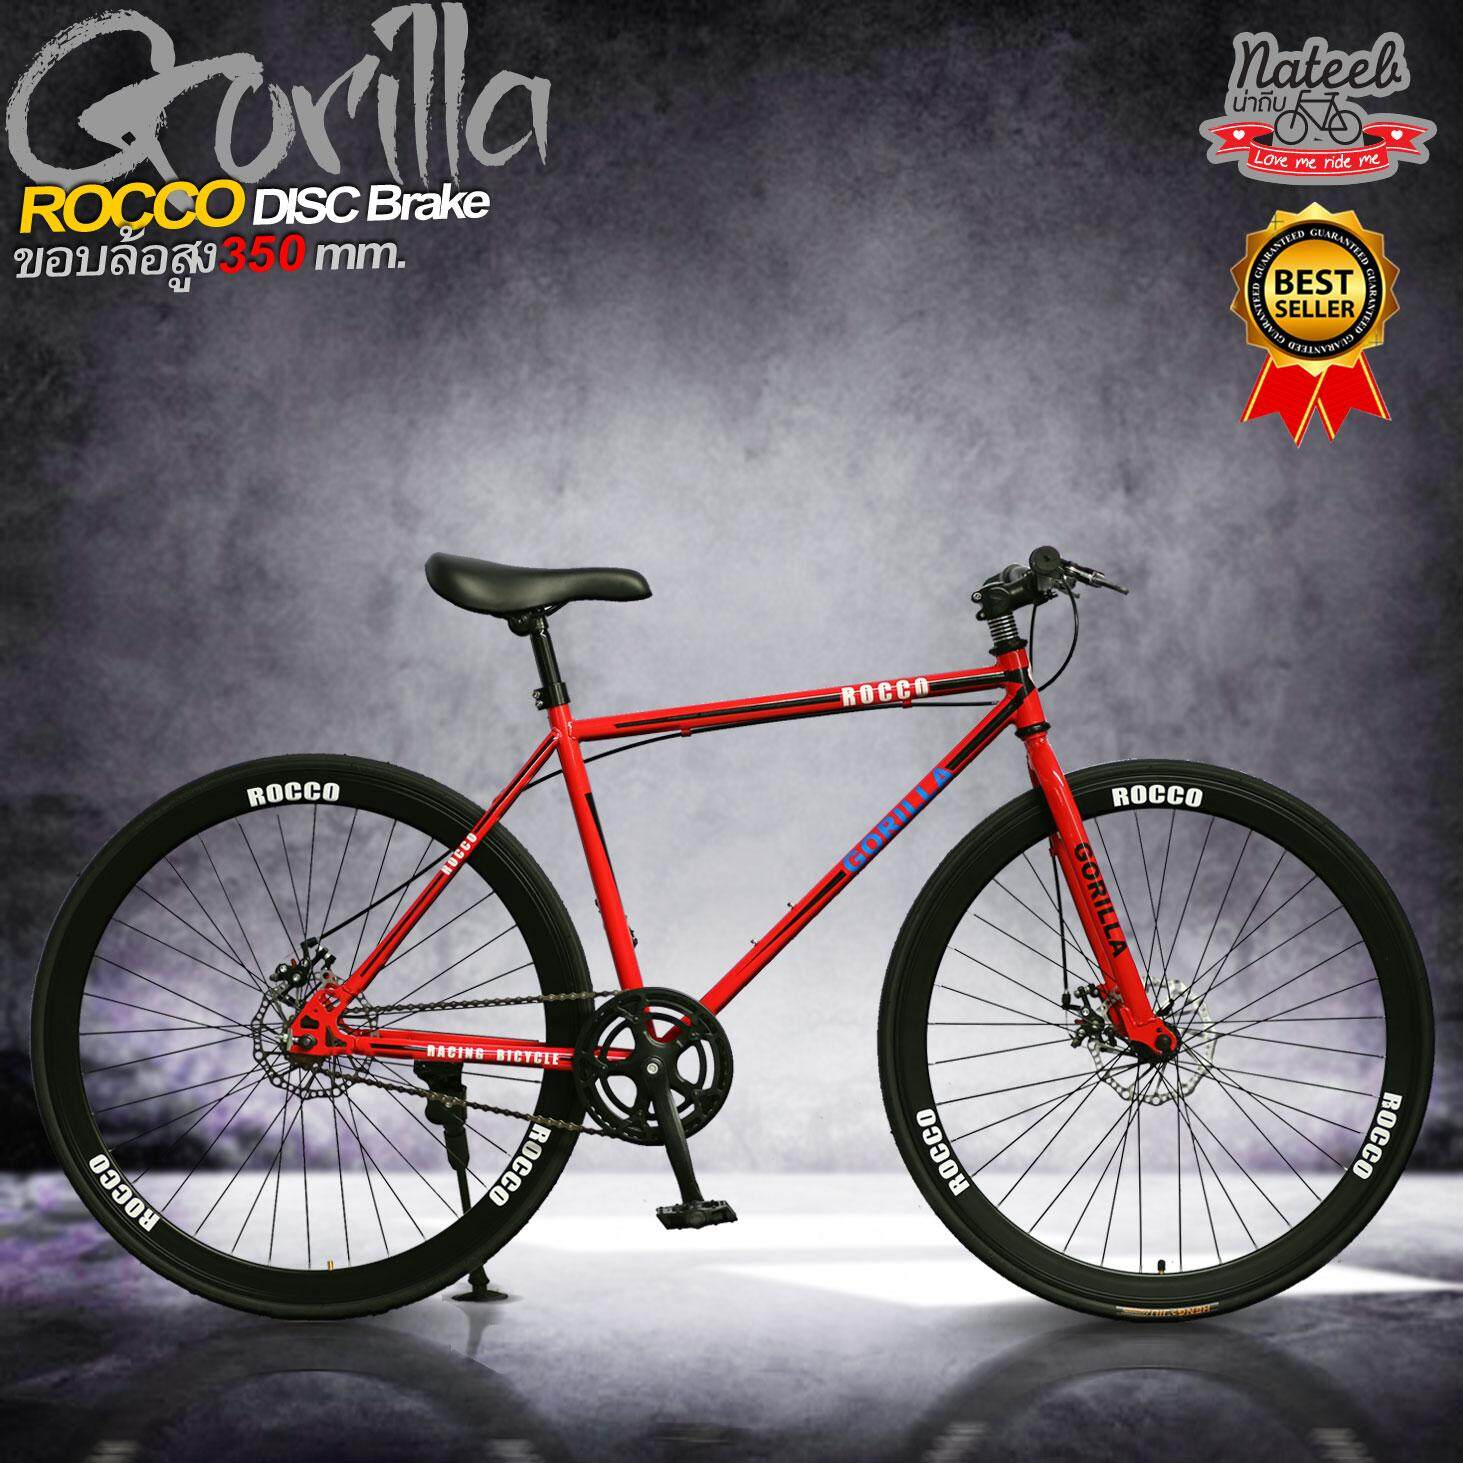 Gorilla:rocco ไฮบริดracing Single Speedดิสเบรคหน้าหลัง By Nateeb Bike.